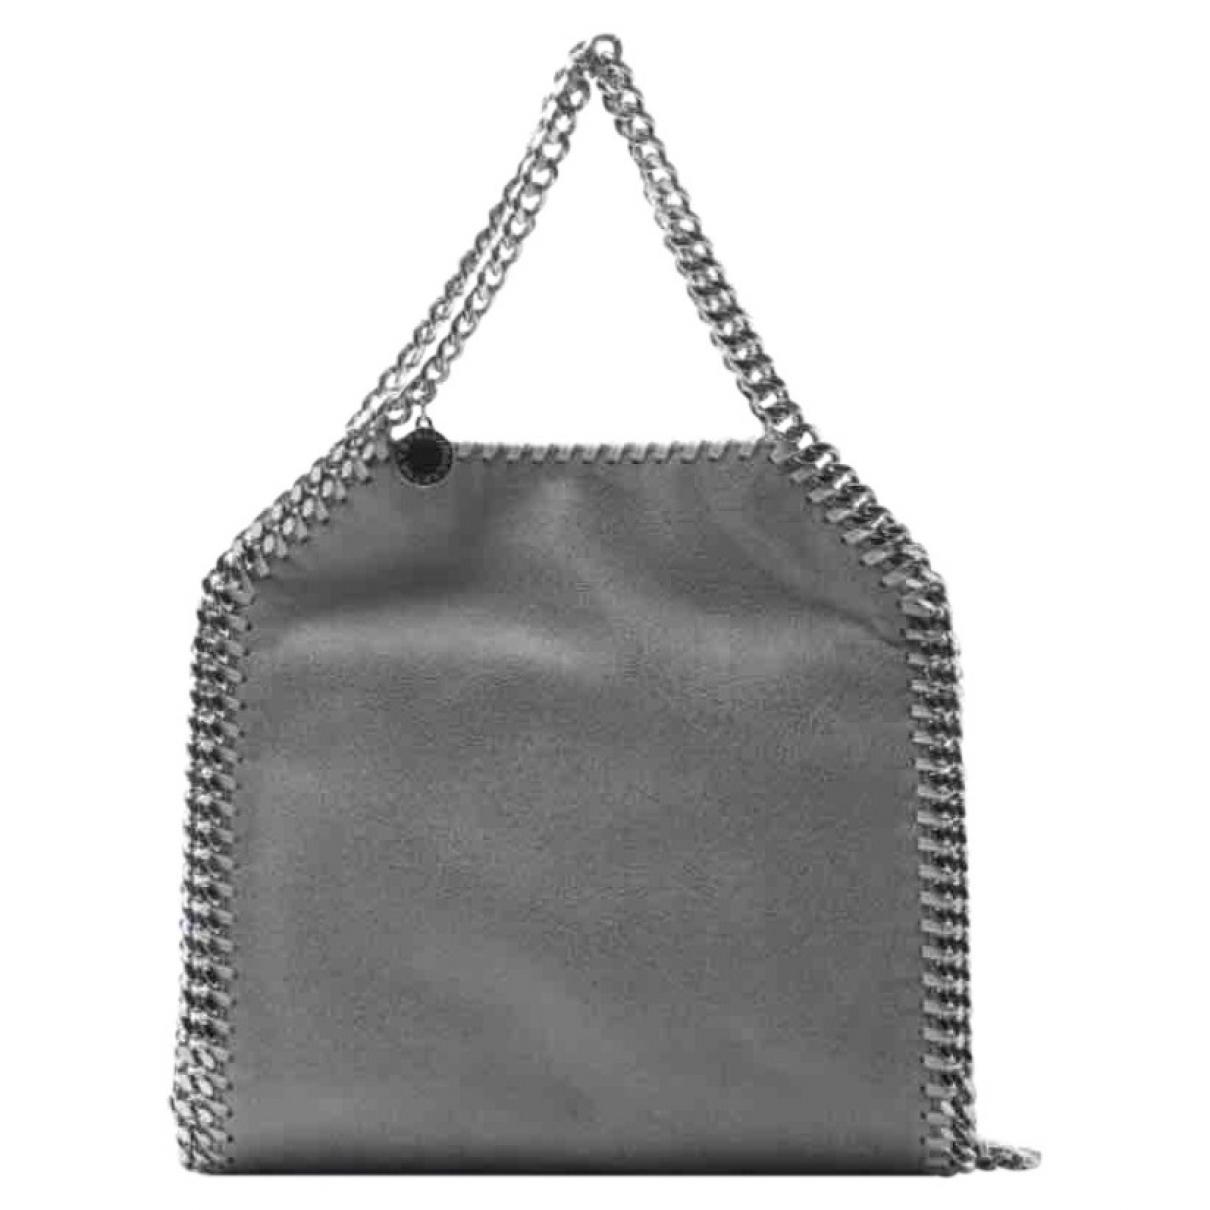 Stella McCartney Synthetic Women's Shoulder Bag Falabella Small Tote shaggy Deer in Grey (Grey)